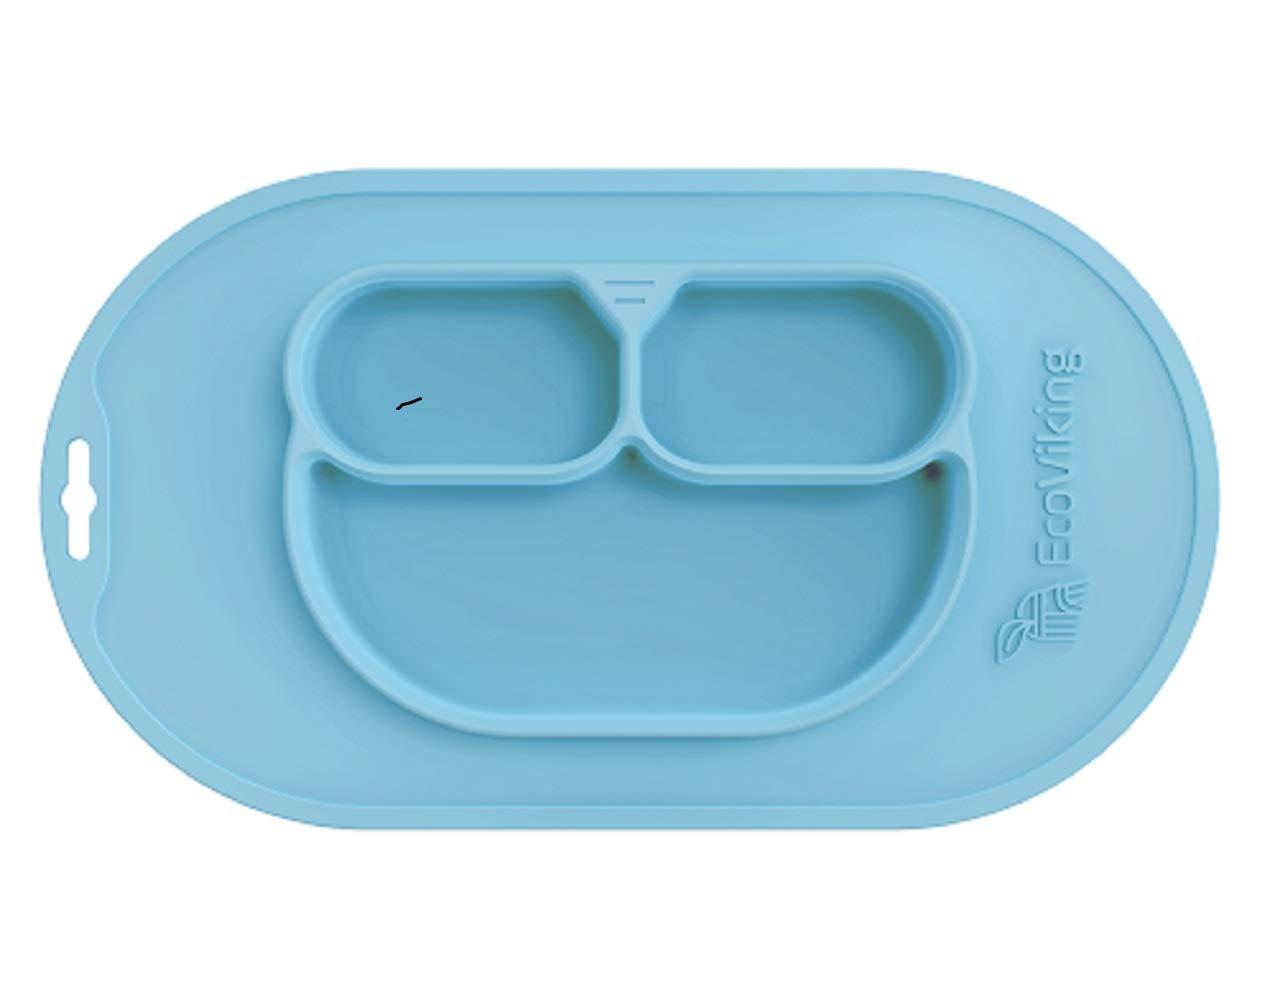 color azul EcoViking EV0100 Bandeja de silicona con accesorios